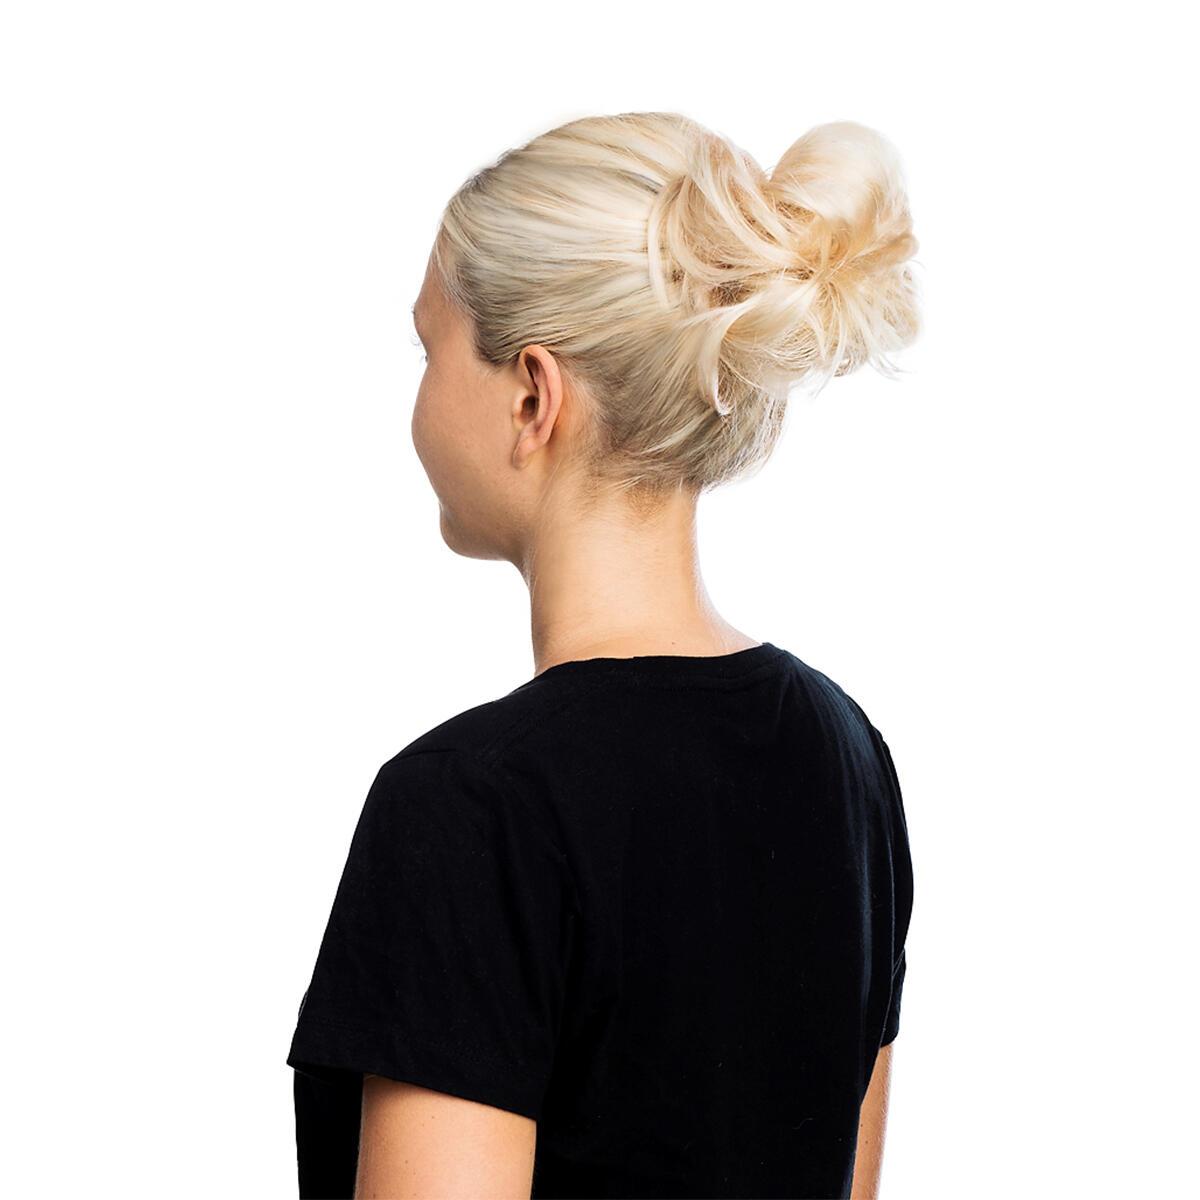 Volume Hair Scrunchie 40 G Scrunchie with real hair 10.7 Light Grey